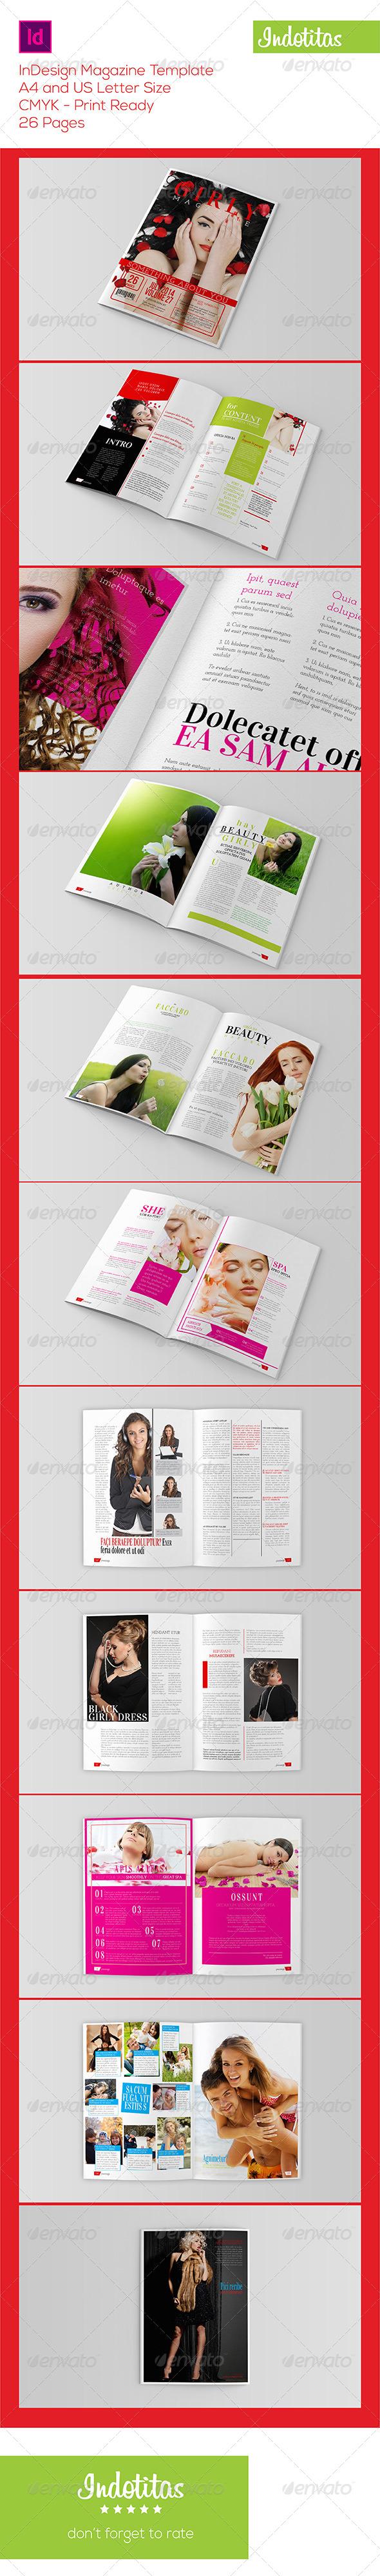 GraphicRiver InDesign Magazine Template 7764855